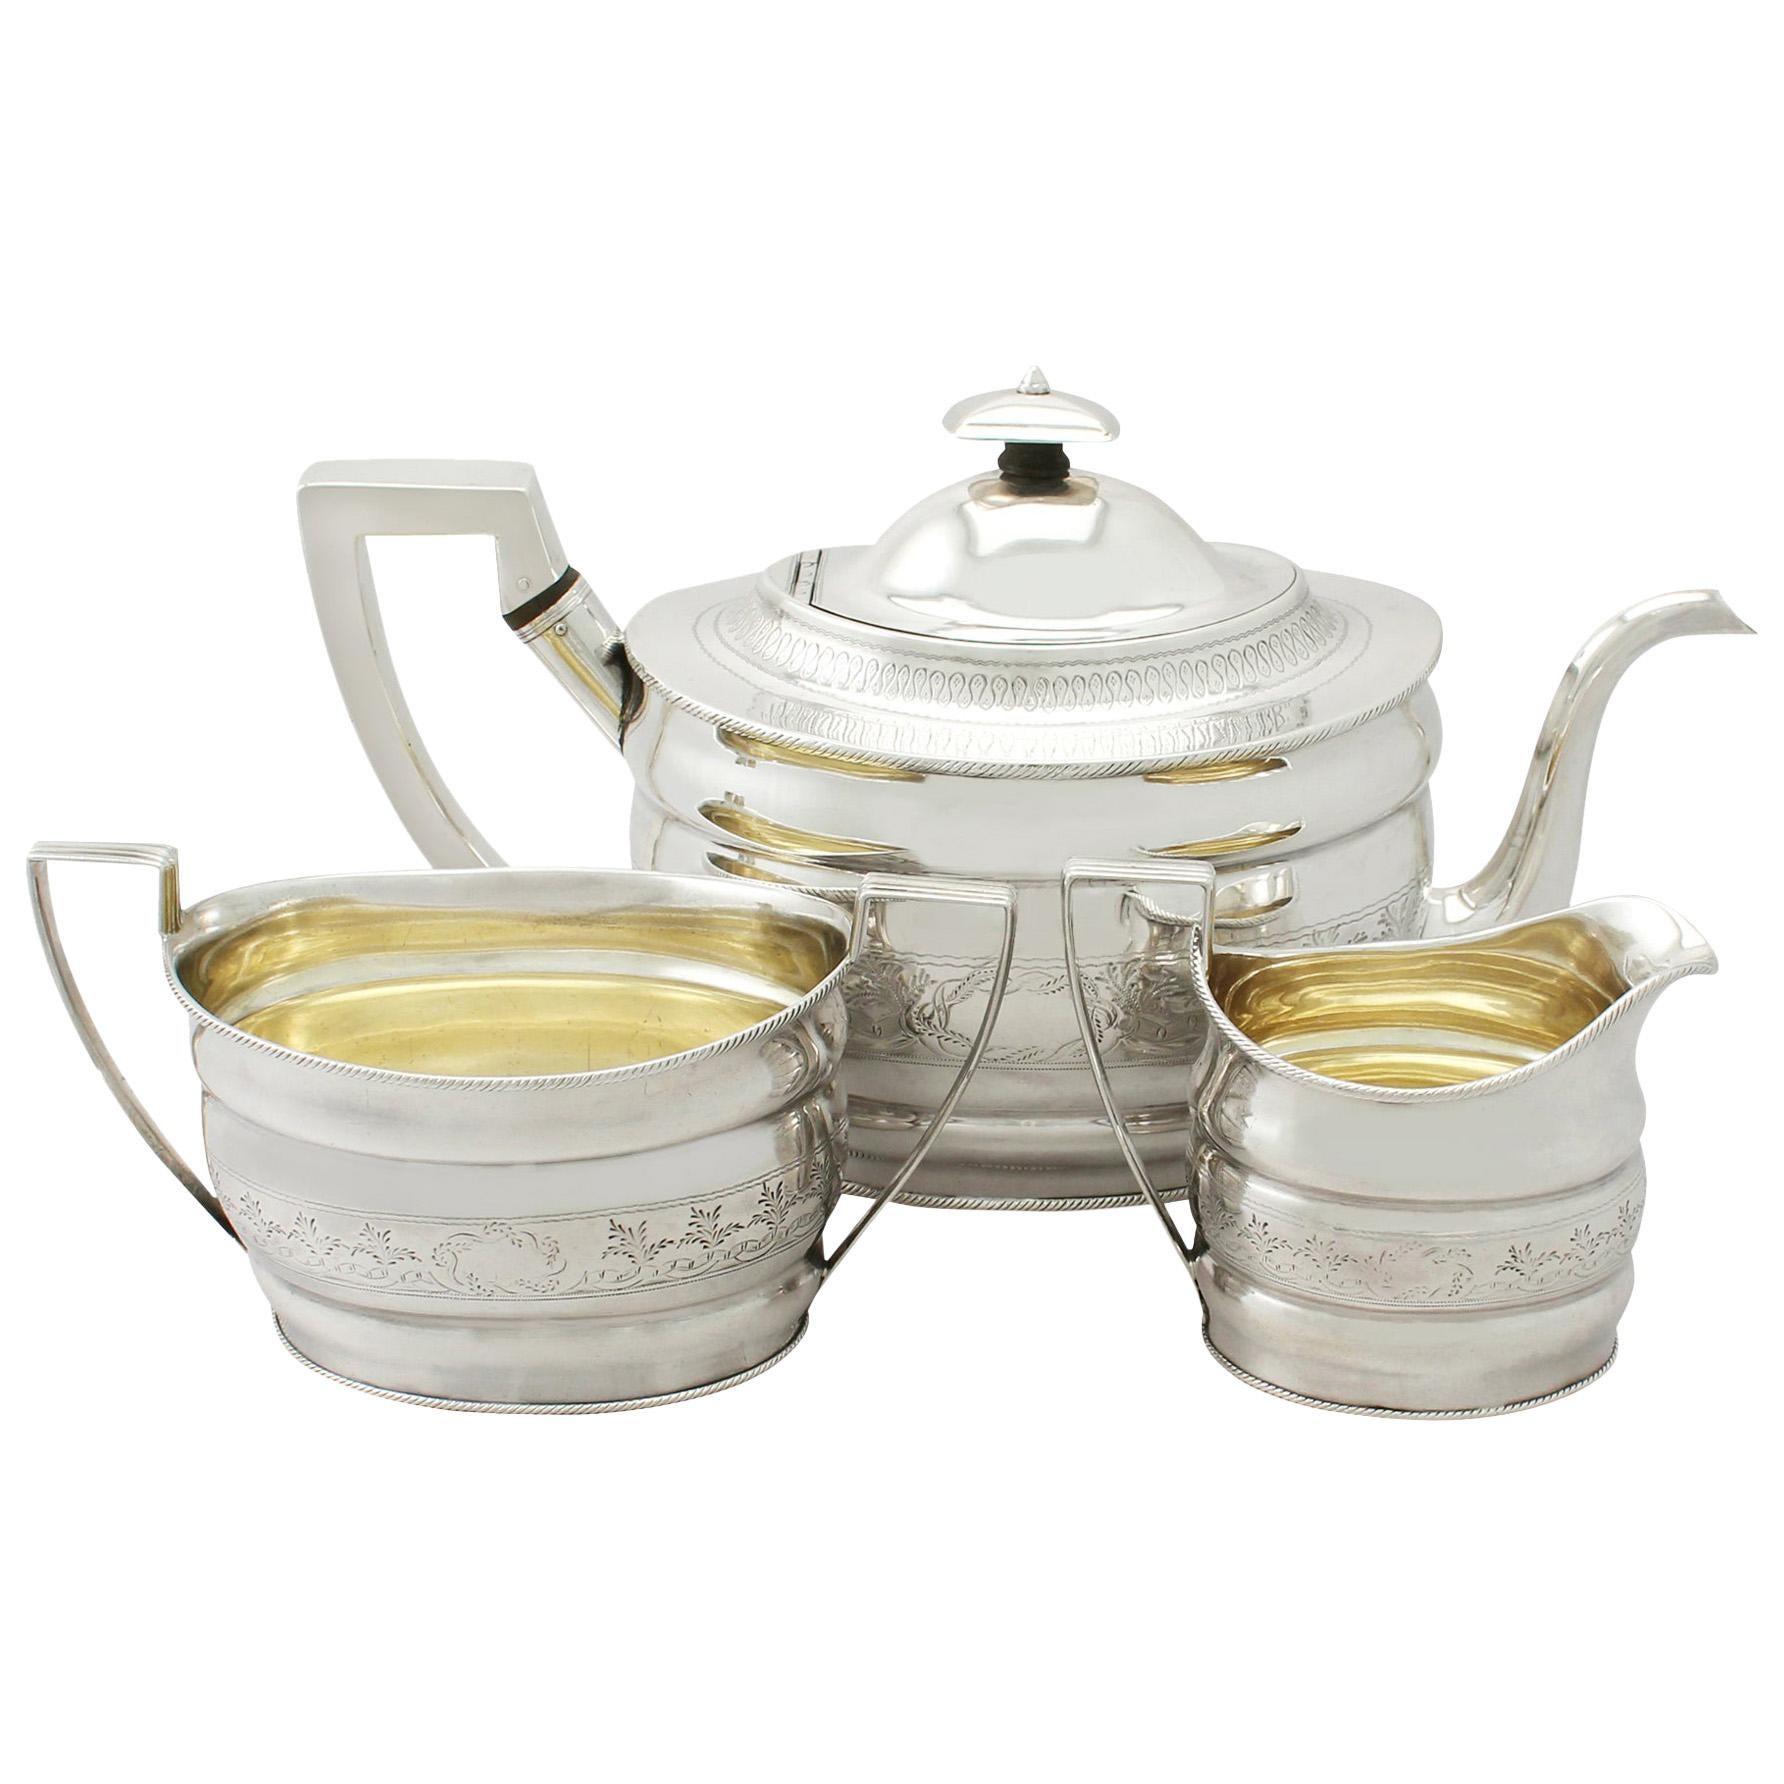 Antique Large Georgian English Sterling Silver Three-Piece Tea Service